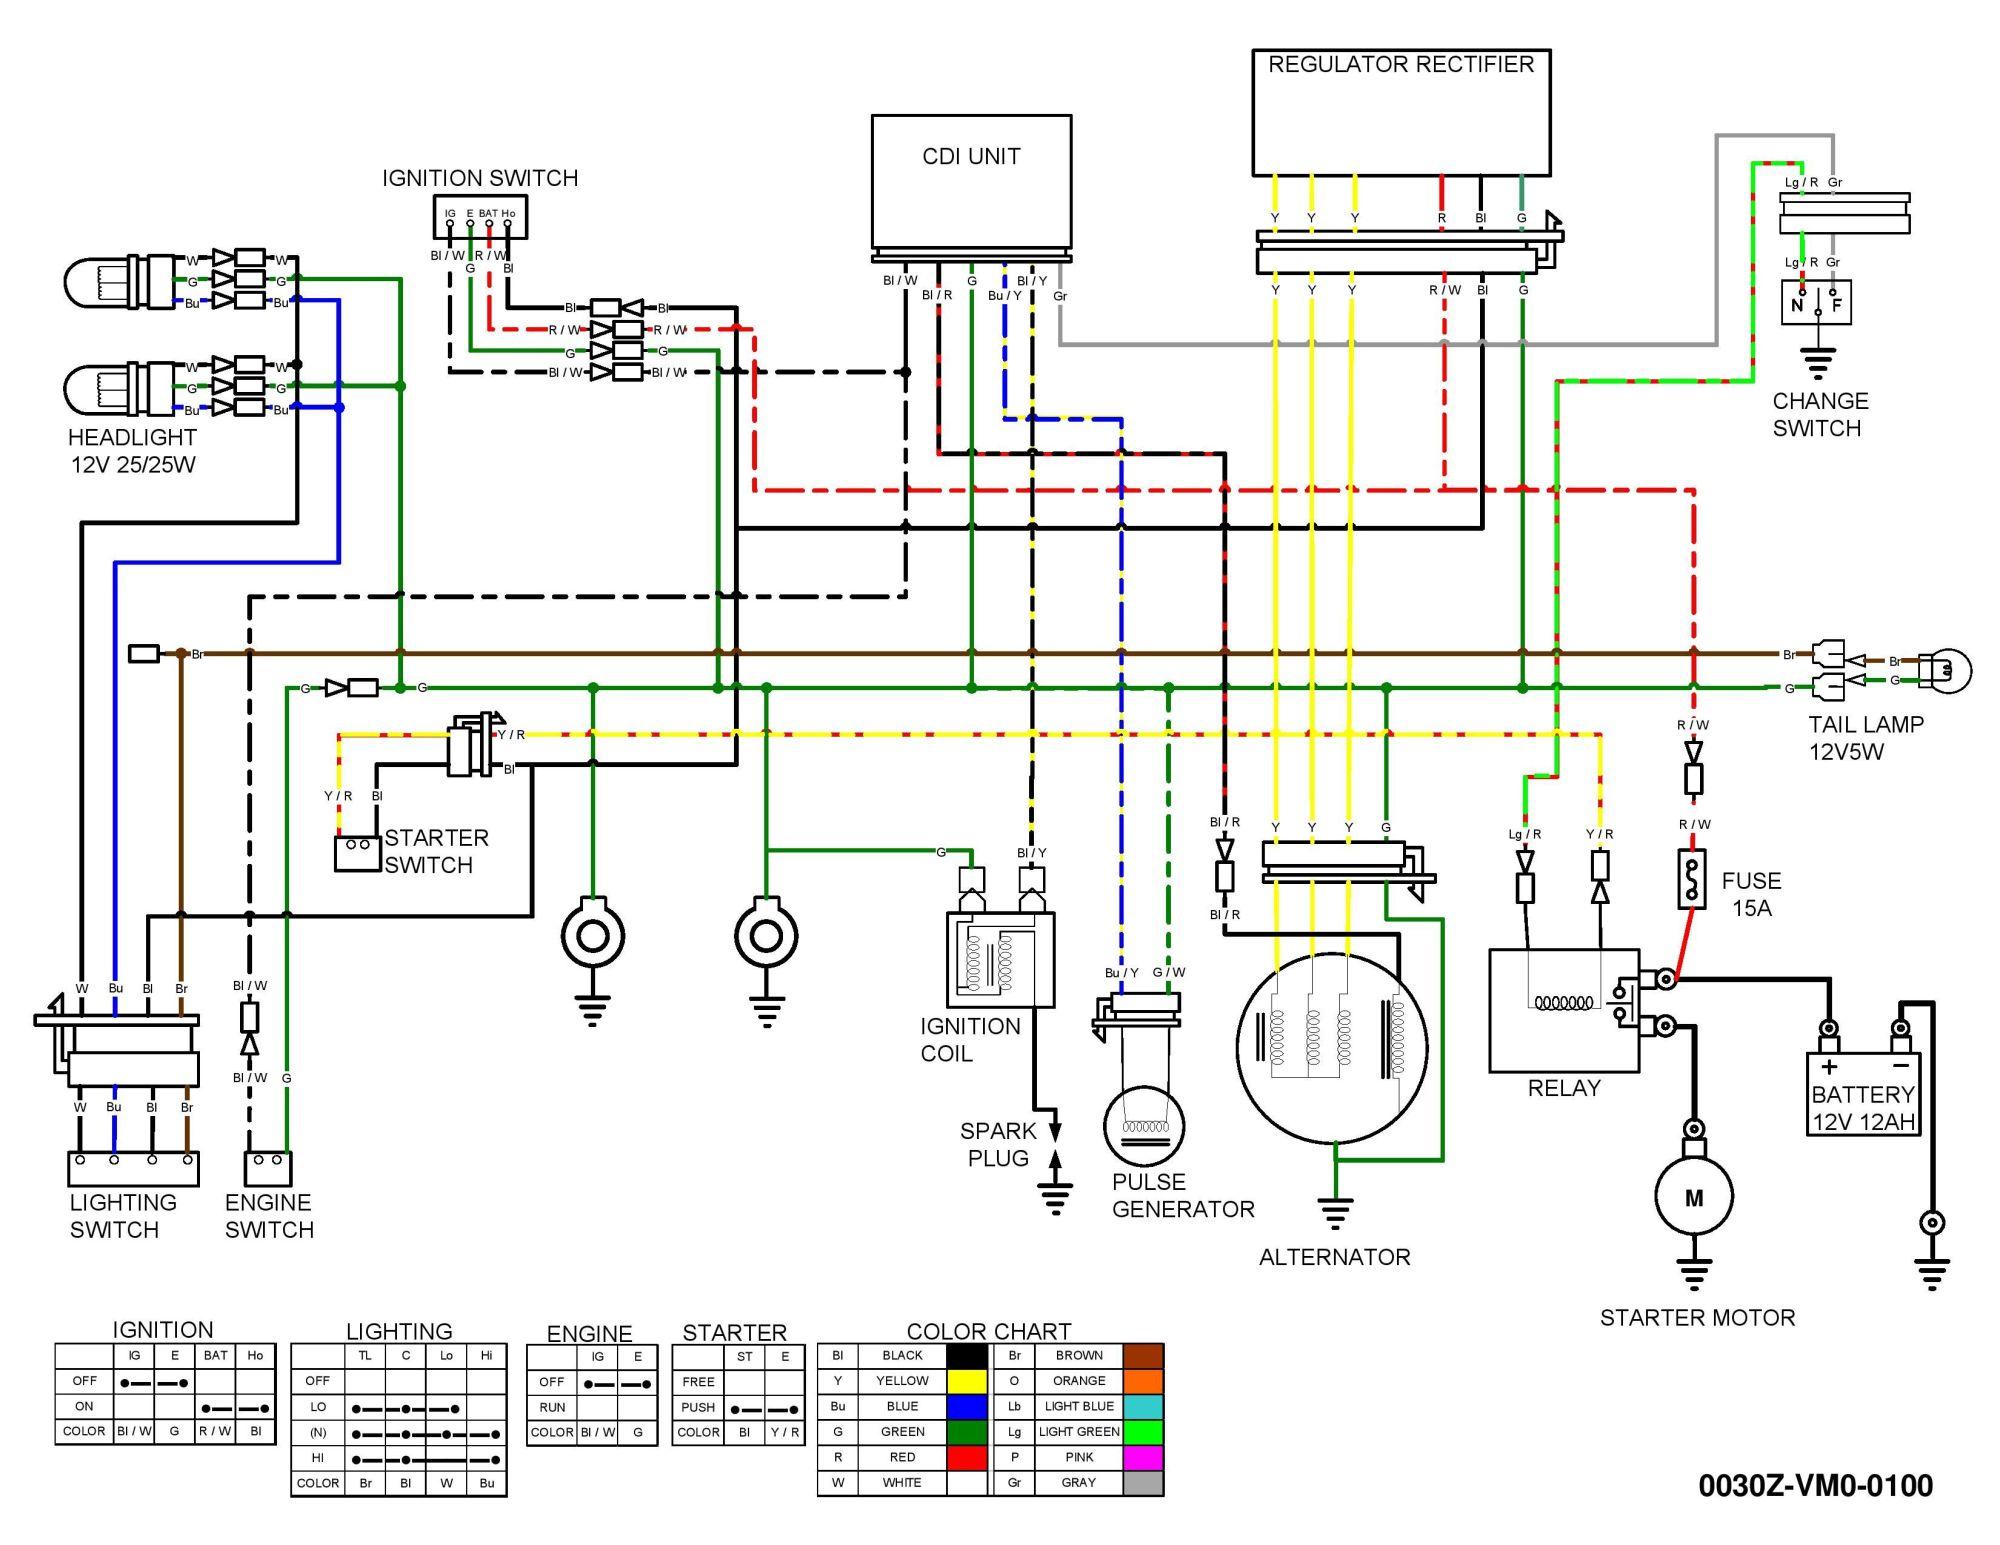 hight resolution of honda odyssey wiring diagram 2007 33 wiring diagram 1997 honda foreman 400 wiring diagram honda foreman